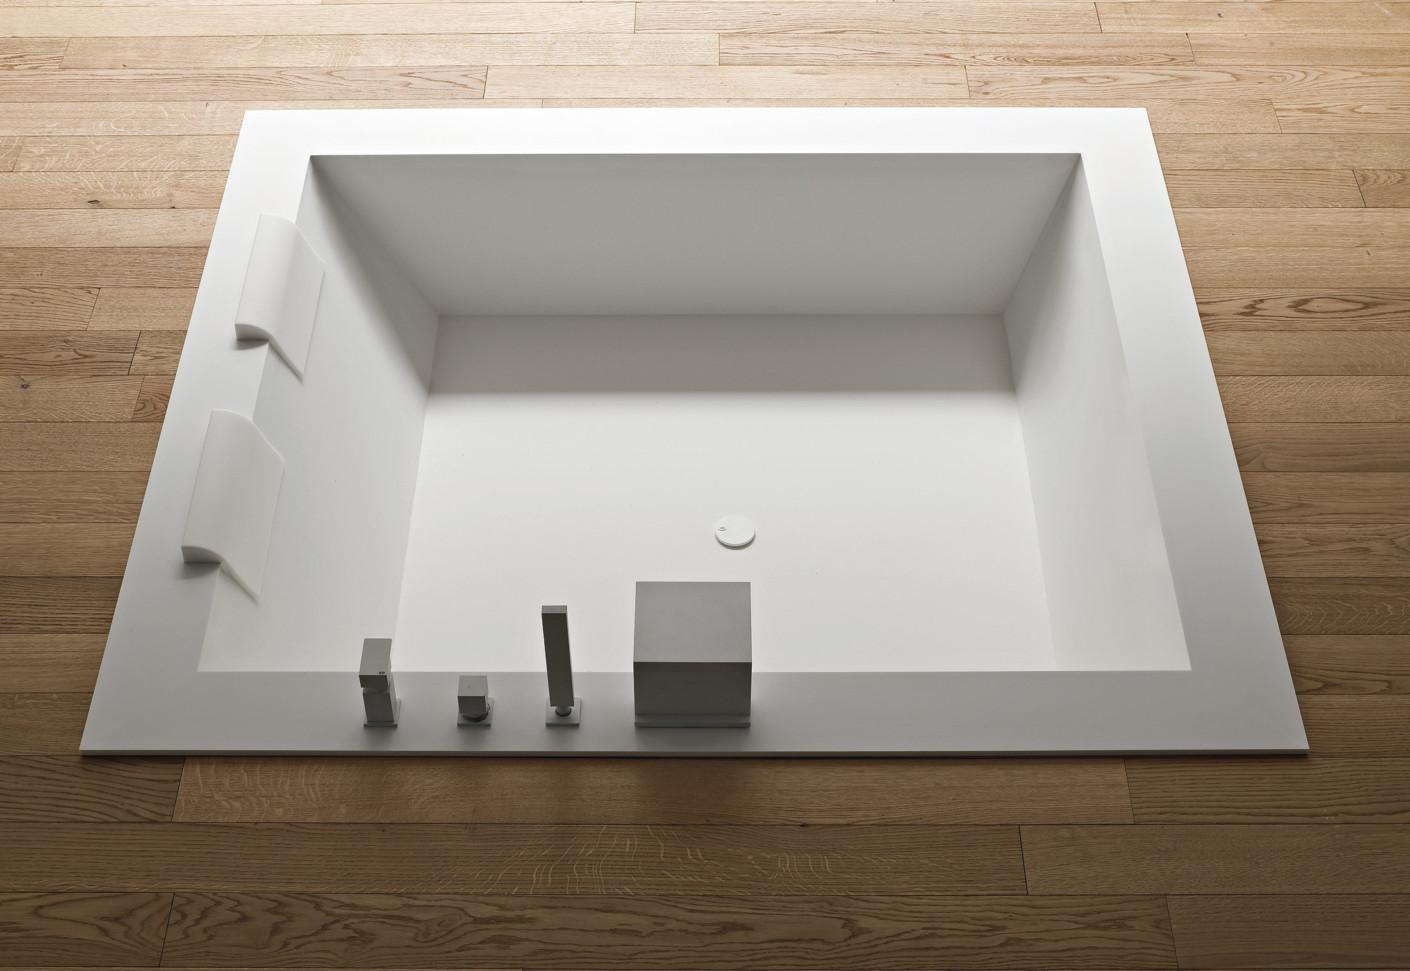 unico badewanne square by rexa design stylepark. Black Bedroom Furniture Sets. Home Design Ideas